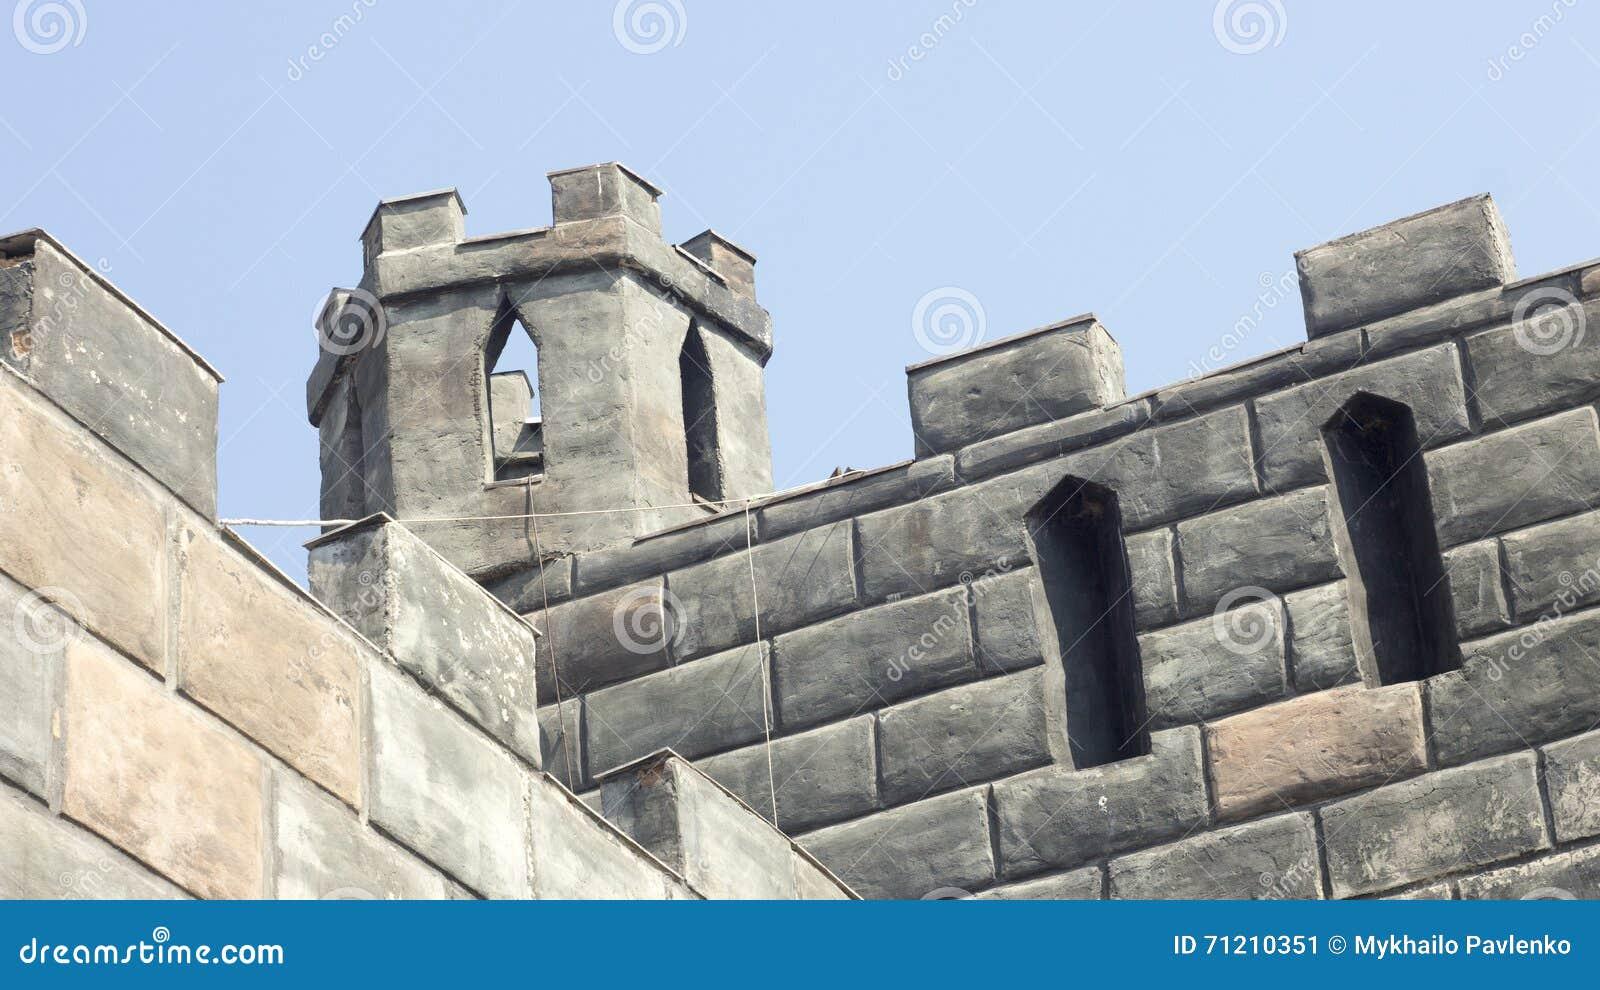 Monumental Construction - The Ancient Greek Architecture   Ancient Rubble Stone